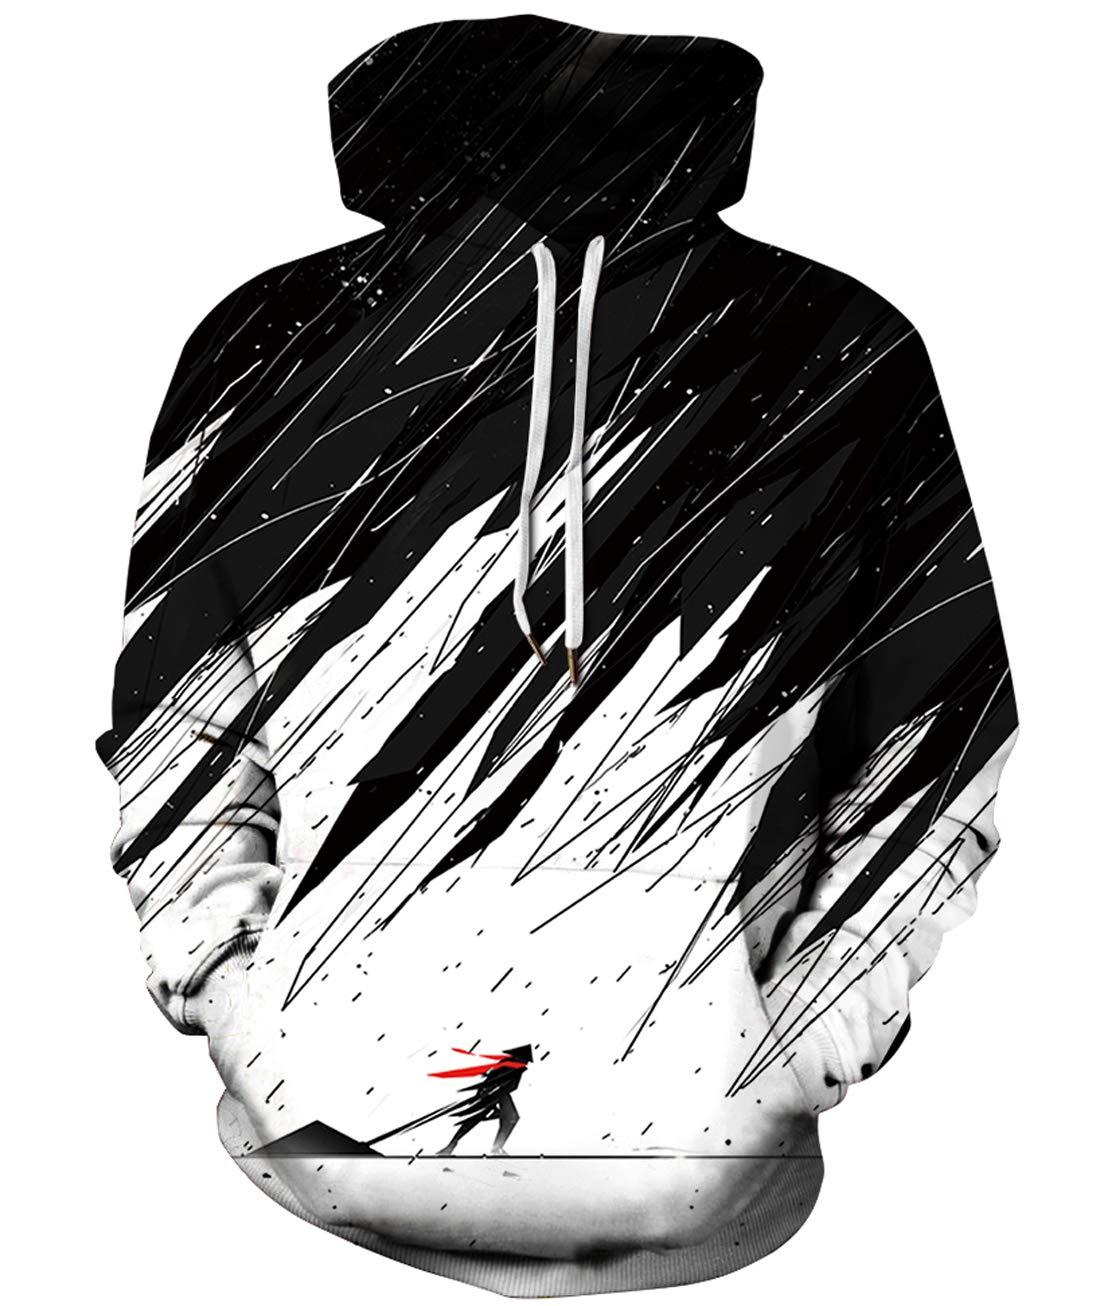 URVIP Unisex Realistic 3D Print Pullover Sweatshirt Hoodies with Big Pockets QYDM-447 XXL/XXXL by URVIP